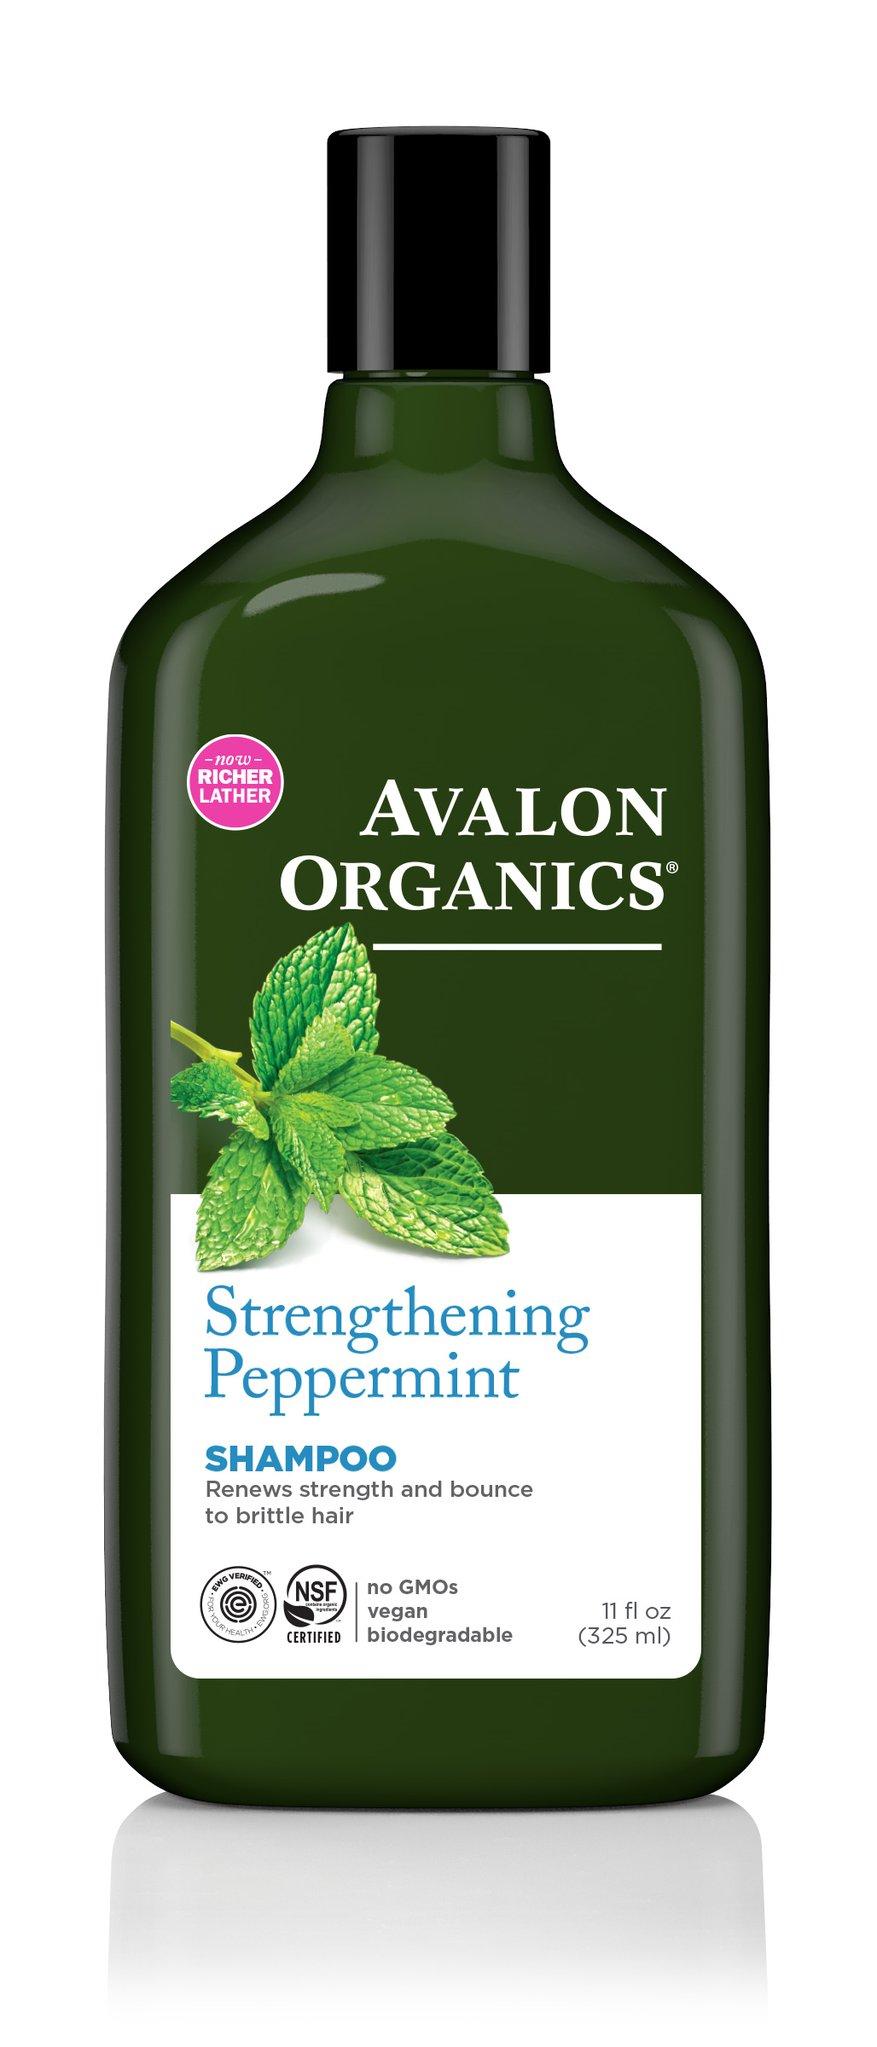 Avalon Organics Strengthenining Peppermint Shampoo, 11 Oz.